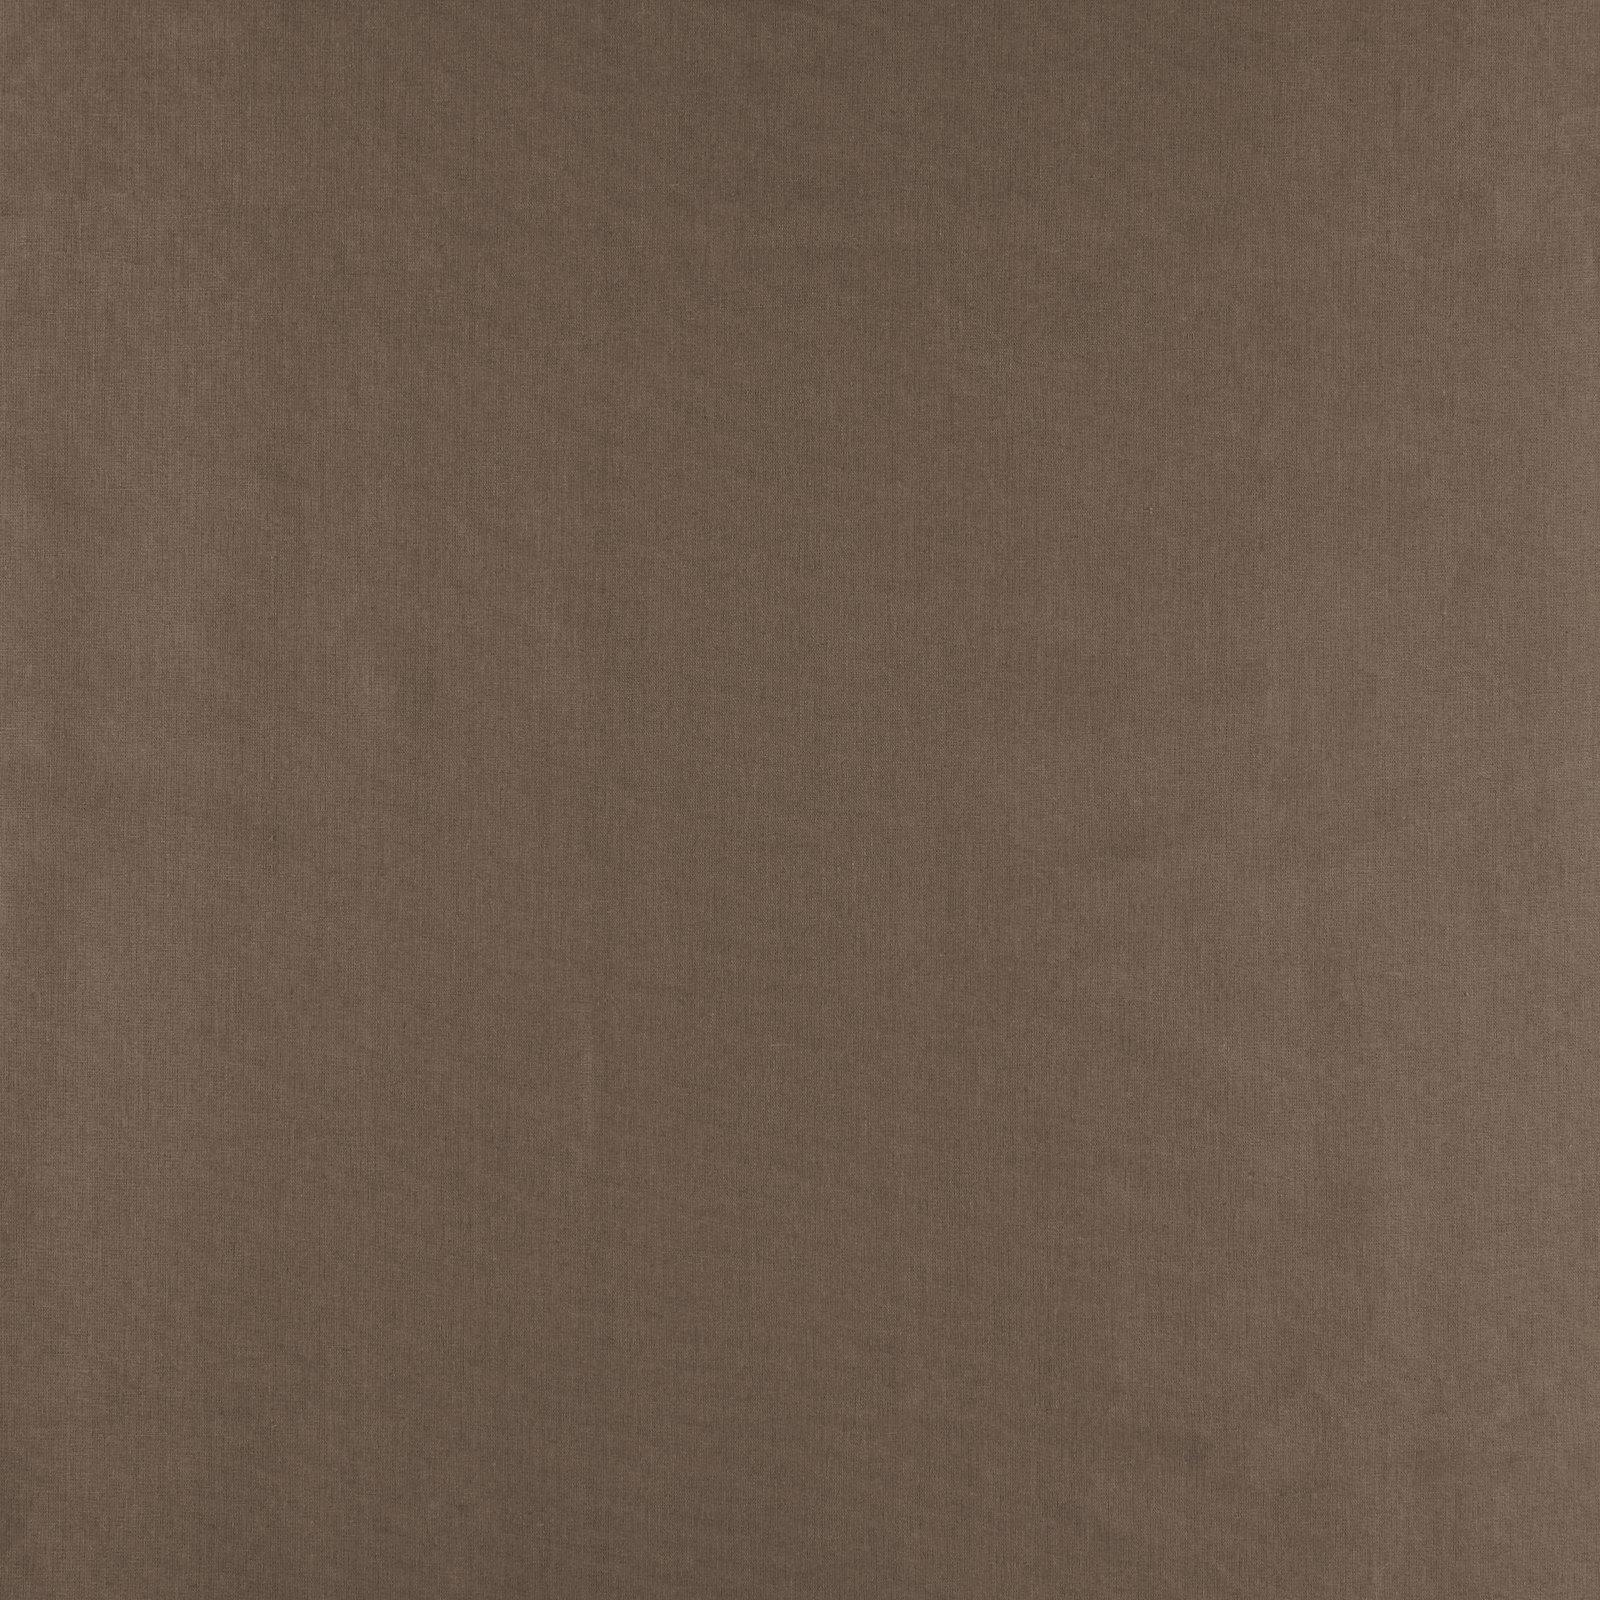 Linen/cotton light walnut 410126_pack_solid